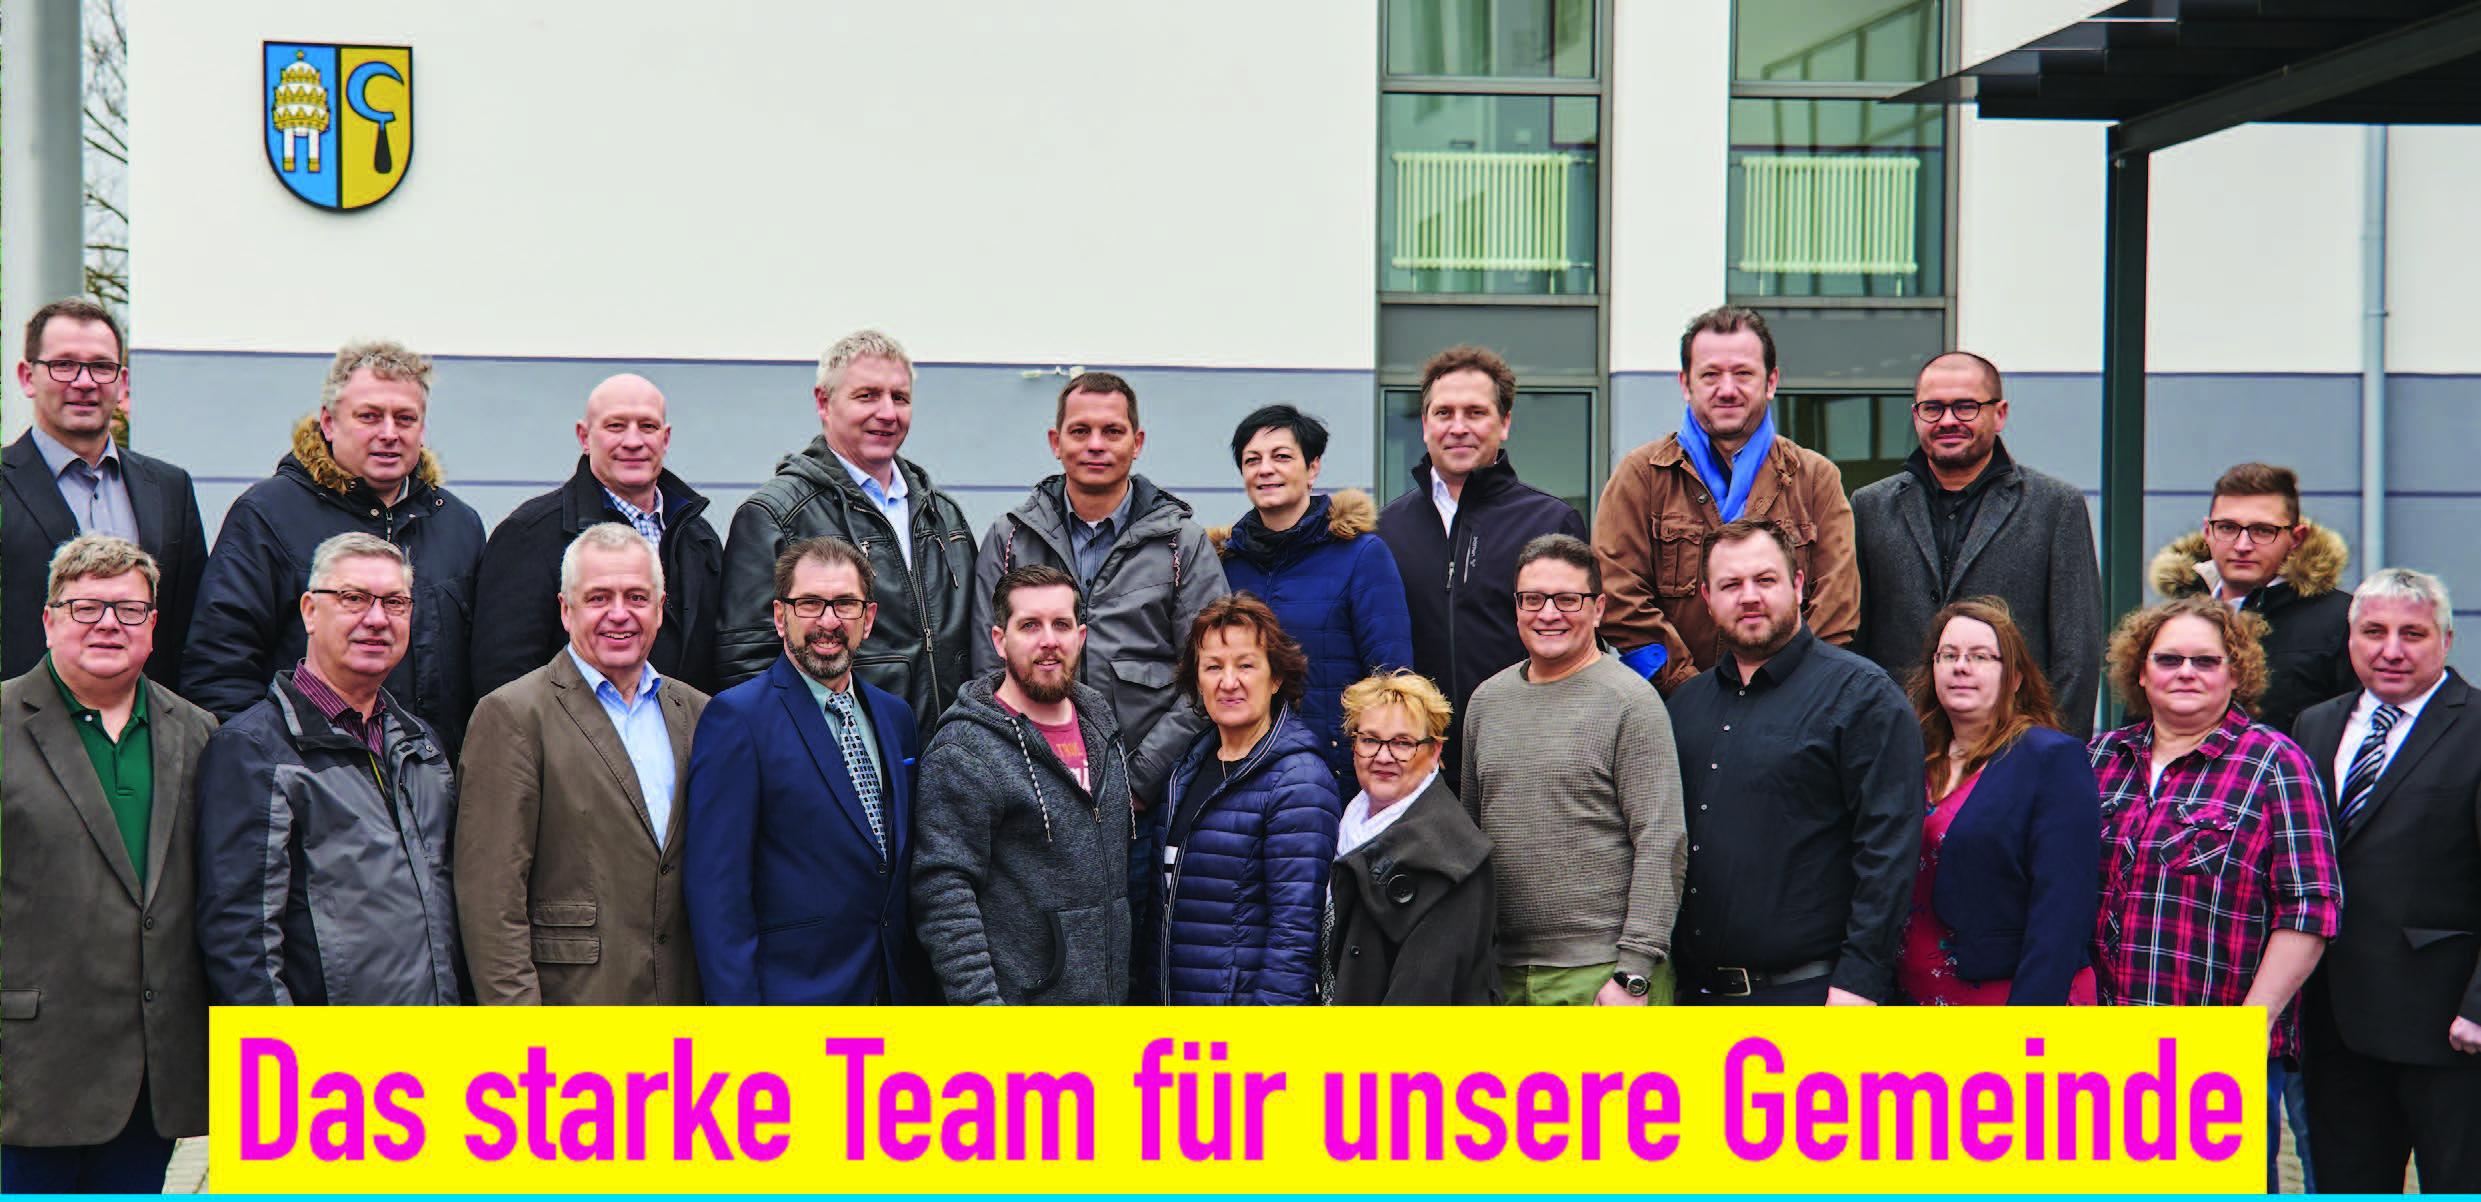 Gruppe Kandidaten 2019